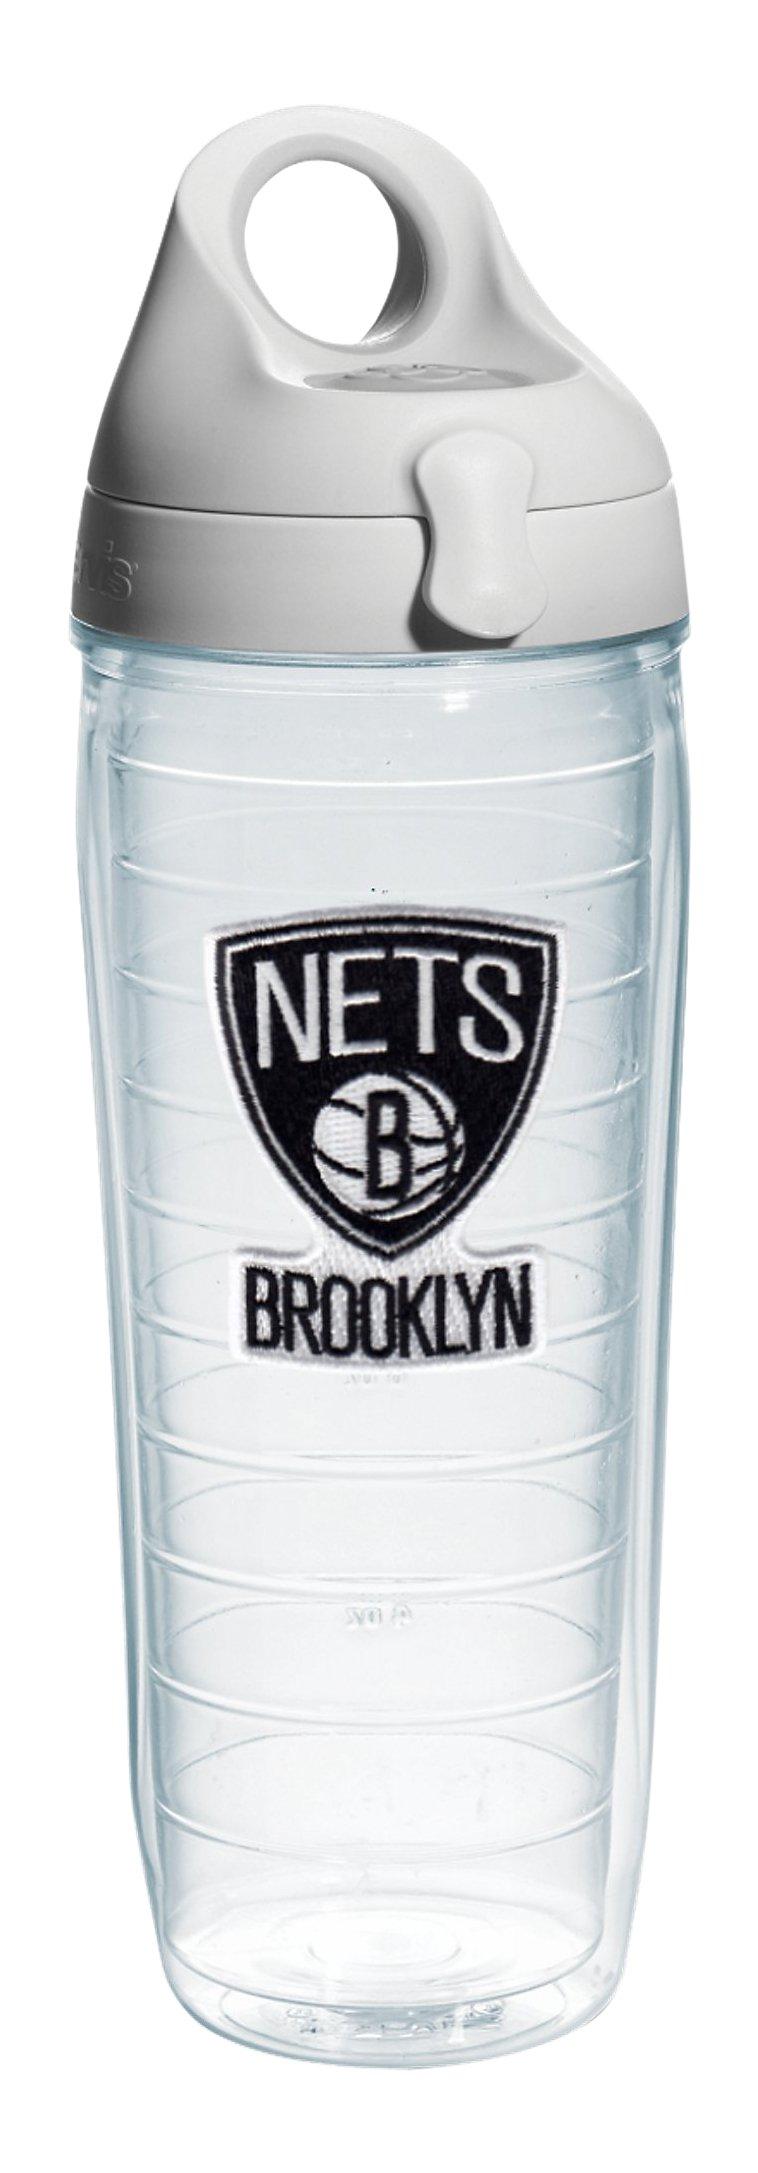 Tervis 1079881 ''NBA Brooklyn Nets'' Water Bottle with Grey Lid, Emblem, 24 oz, Clear